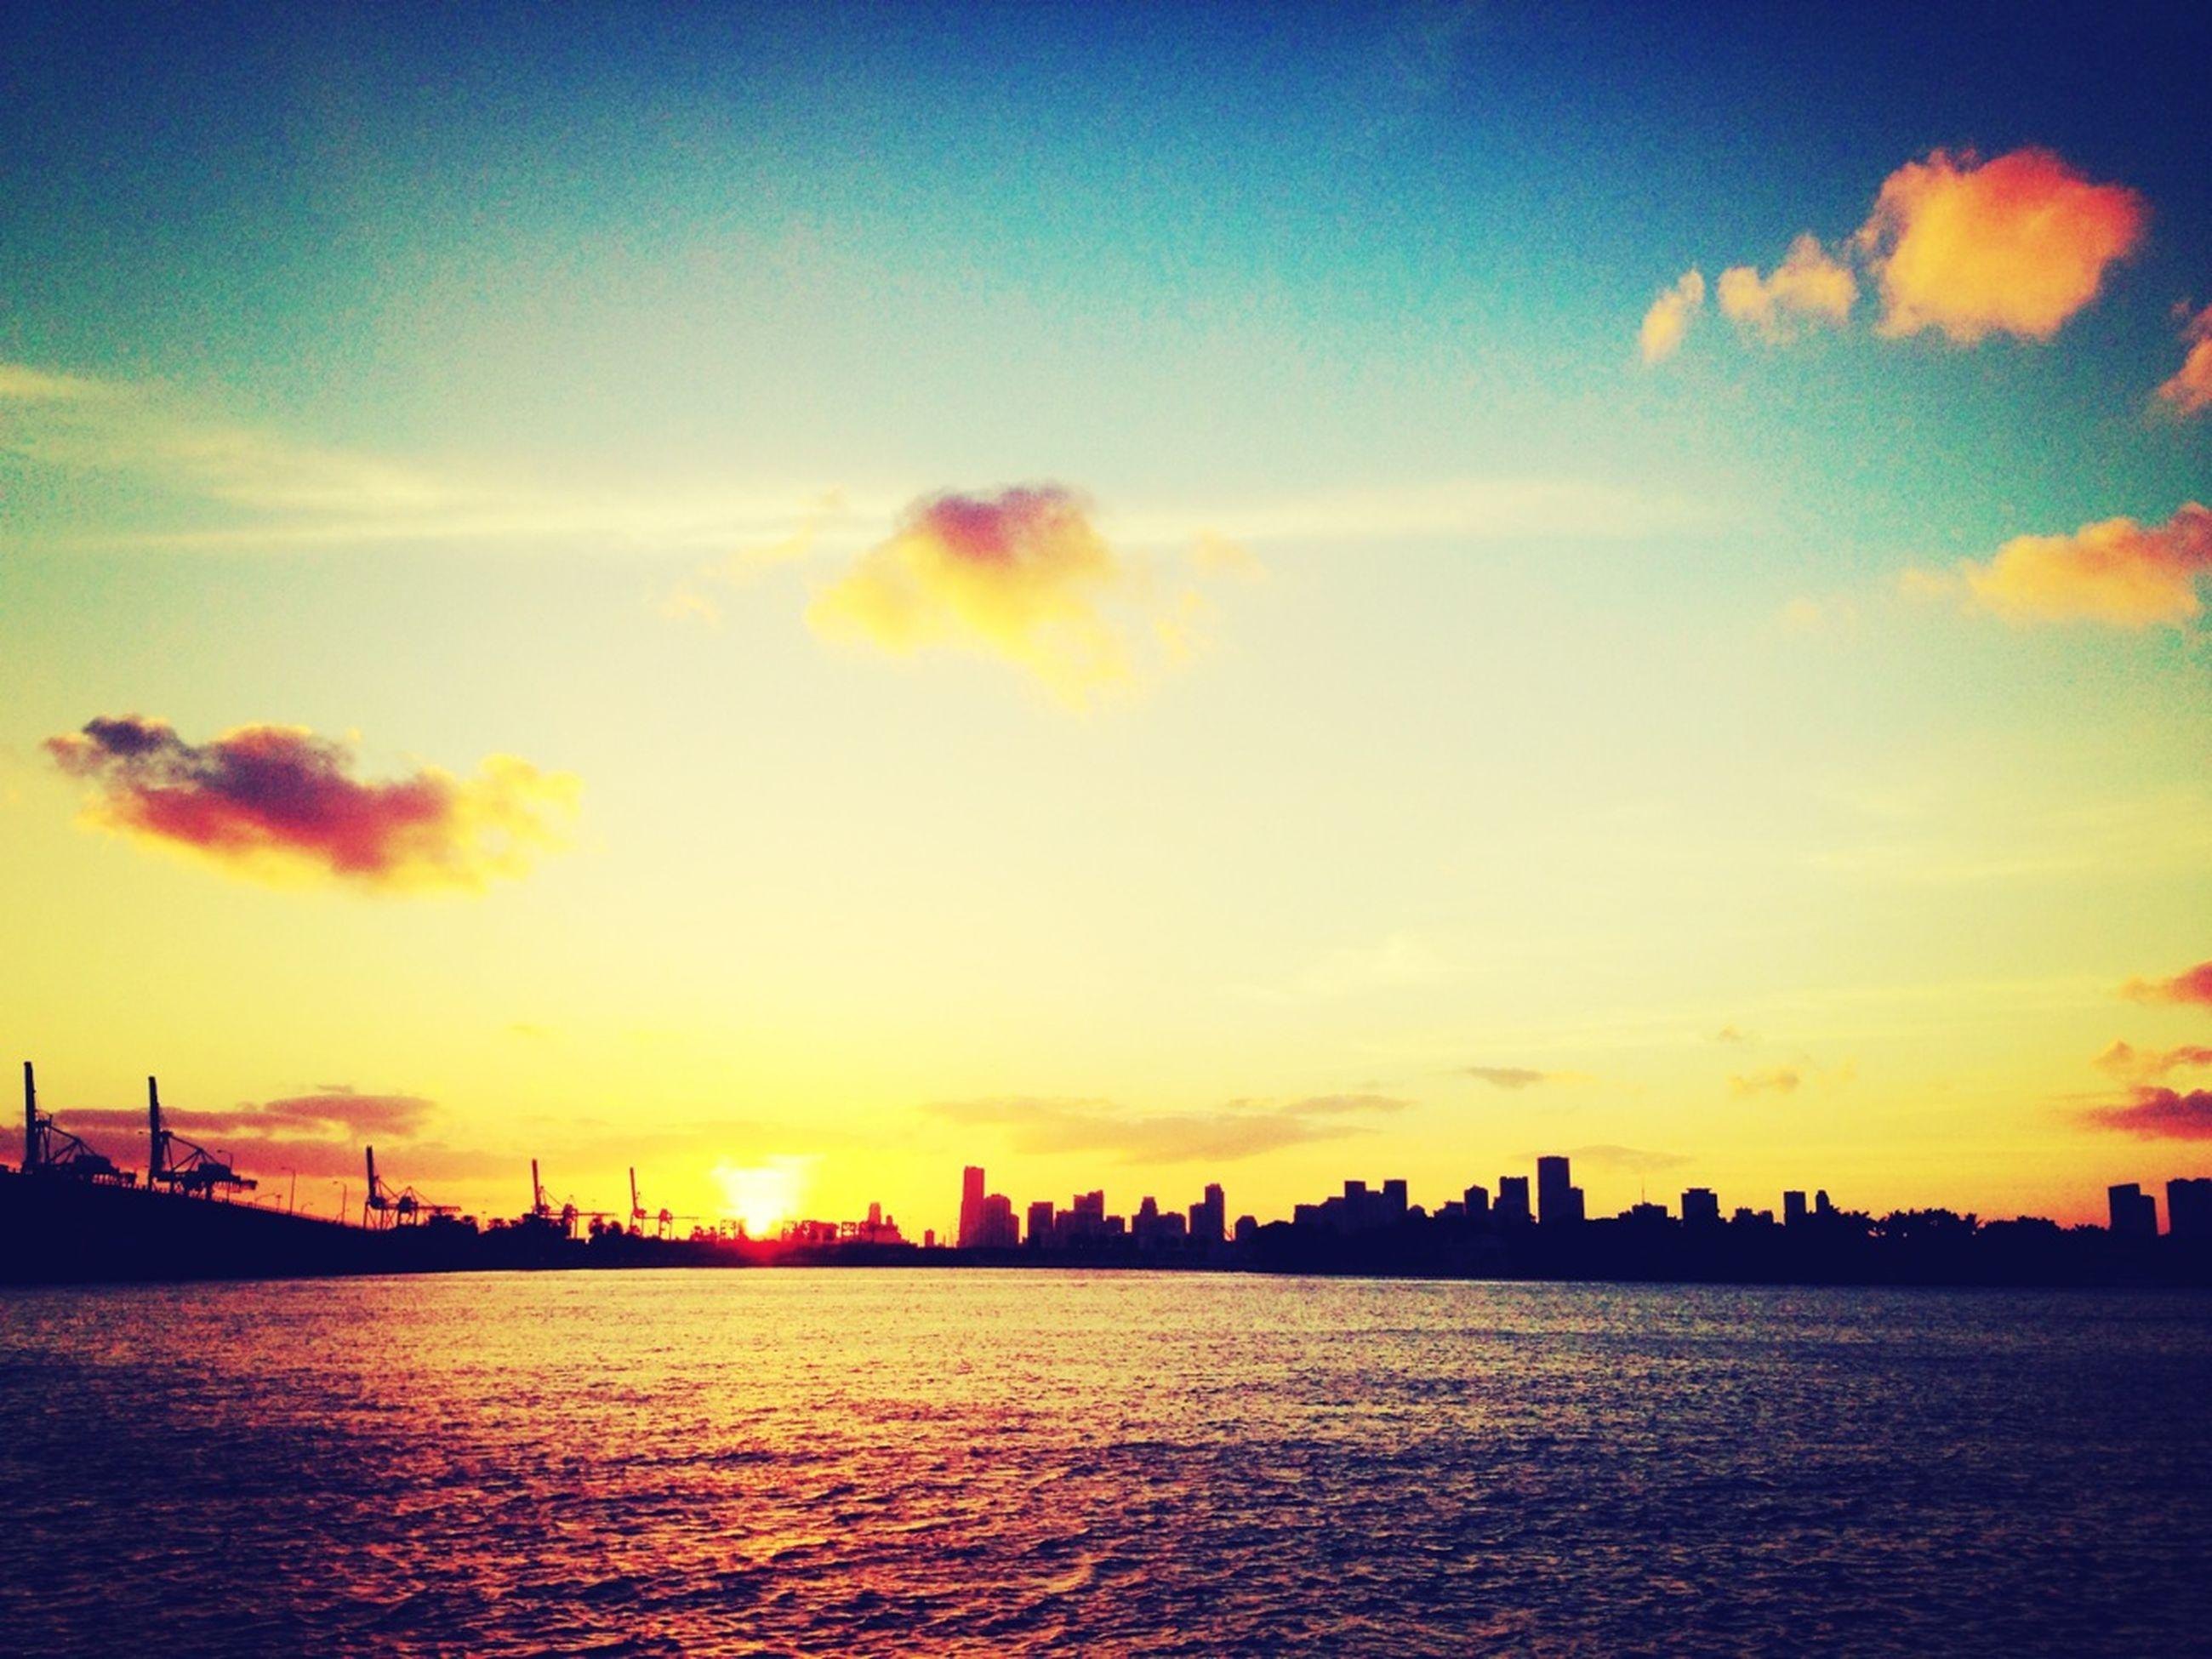 sunset, waterfront, building exterior, architecture, water, built structure, city, sky, cityscape, orange color, sea, silhouette, urban skyline, skyscraper, skyline, river, scenics, tower, cloud - sky, beauty in nature